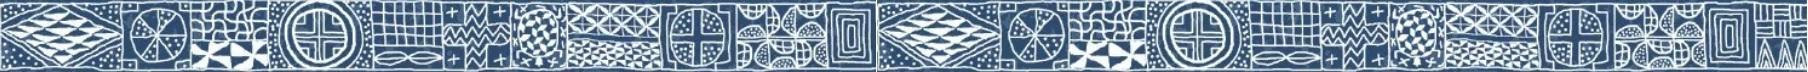 Ndop bandelette decorative horizontale